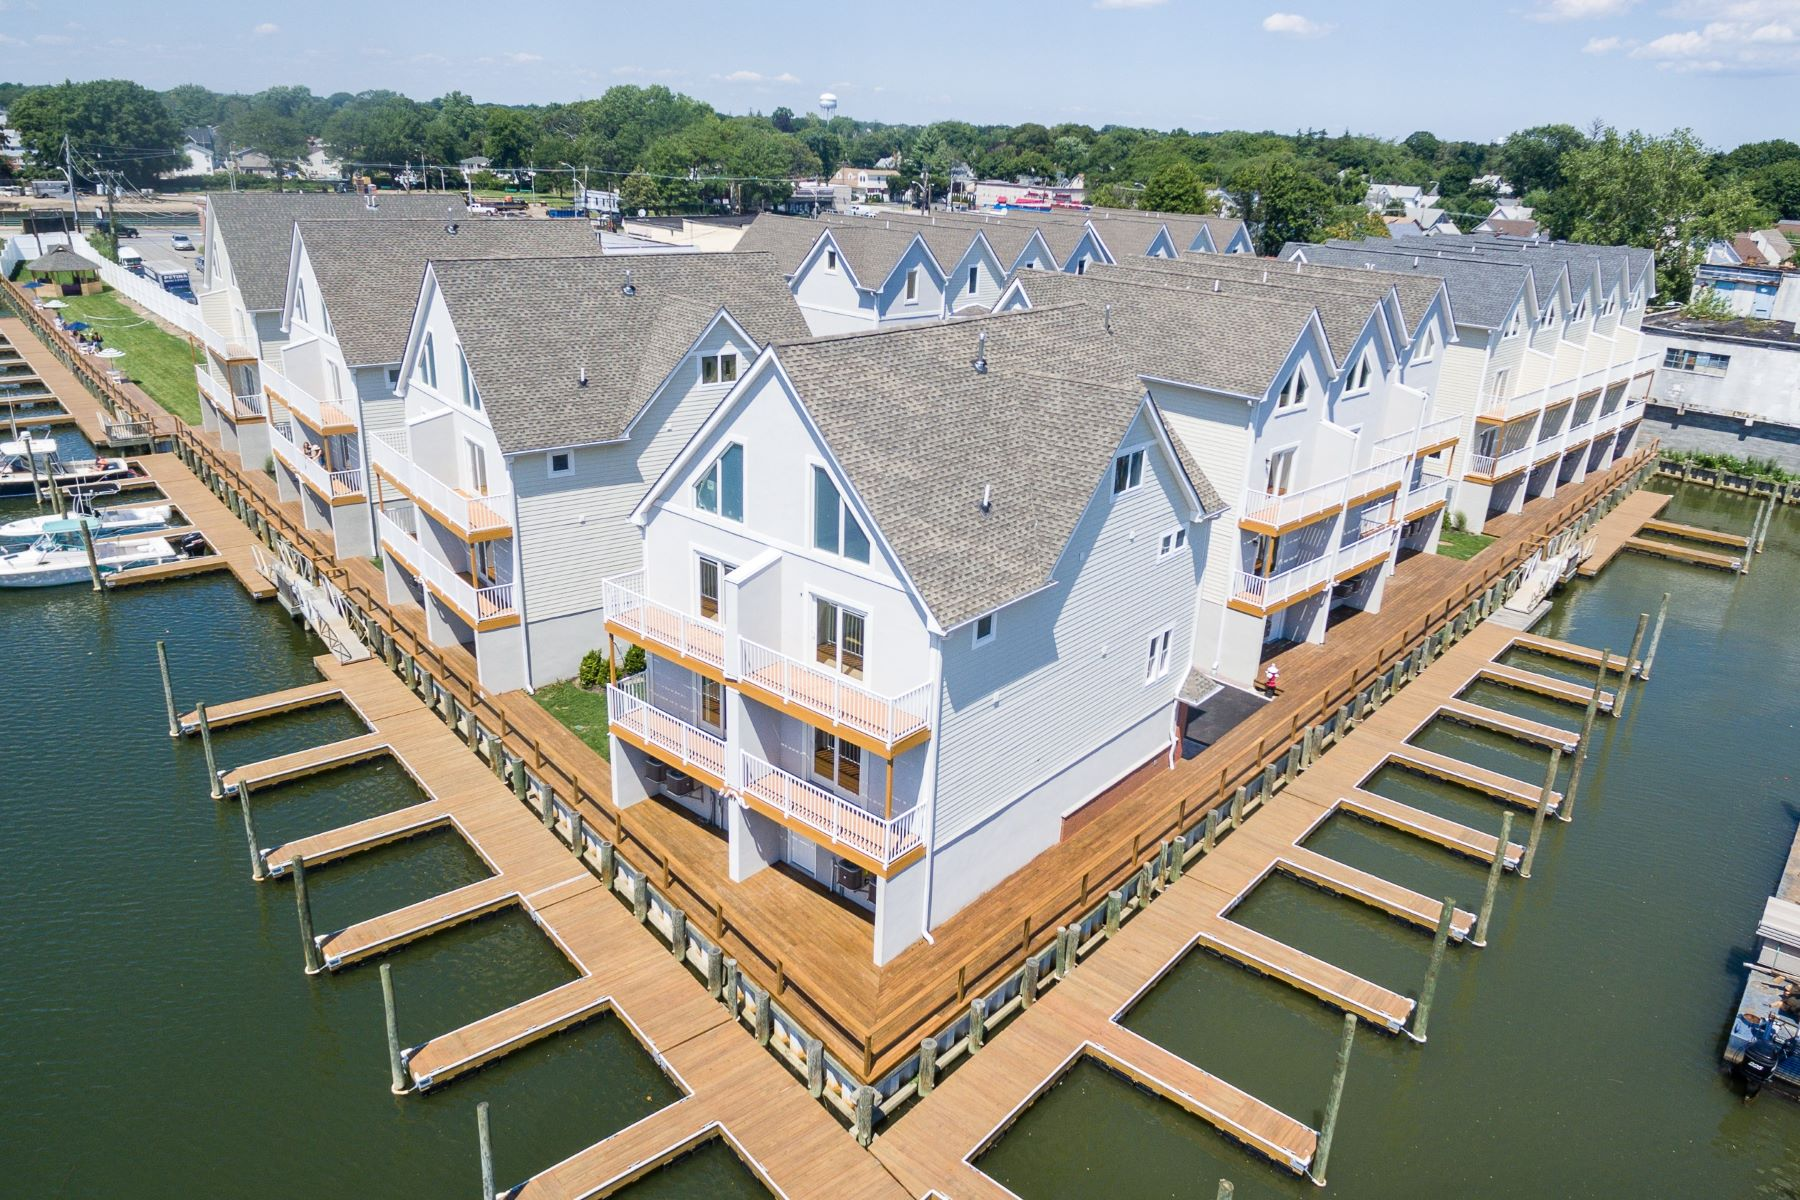 Condominium for Sale at Condo 600 Ray St 18 Freeport, New York 11520 United States